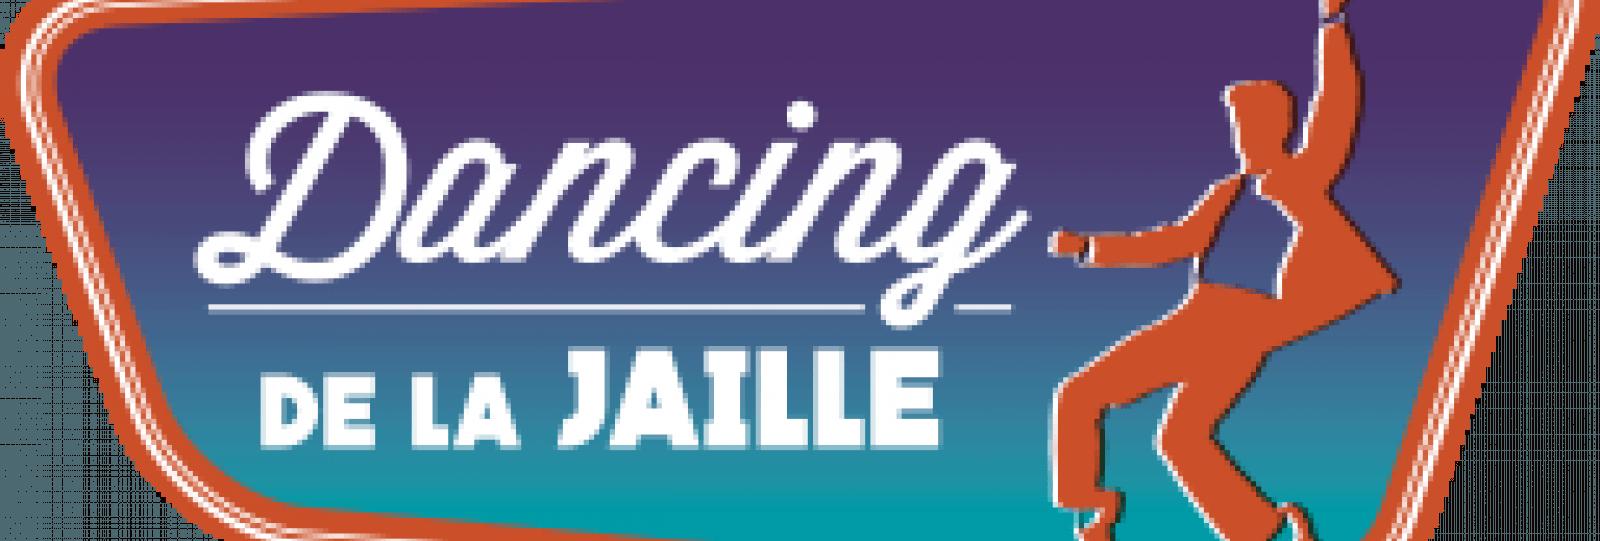 Dancing de la Jaille